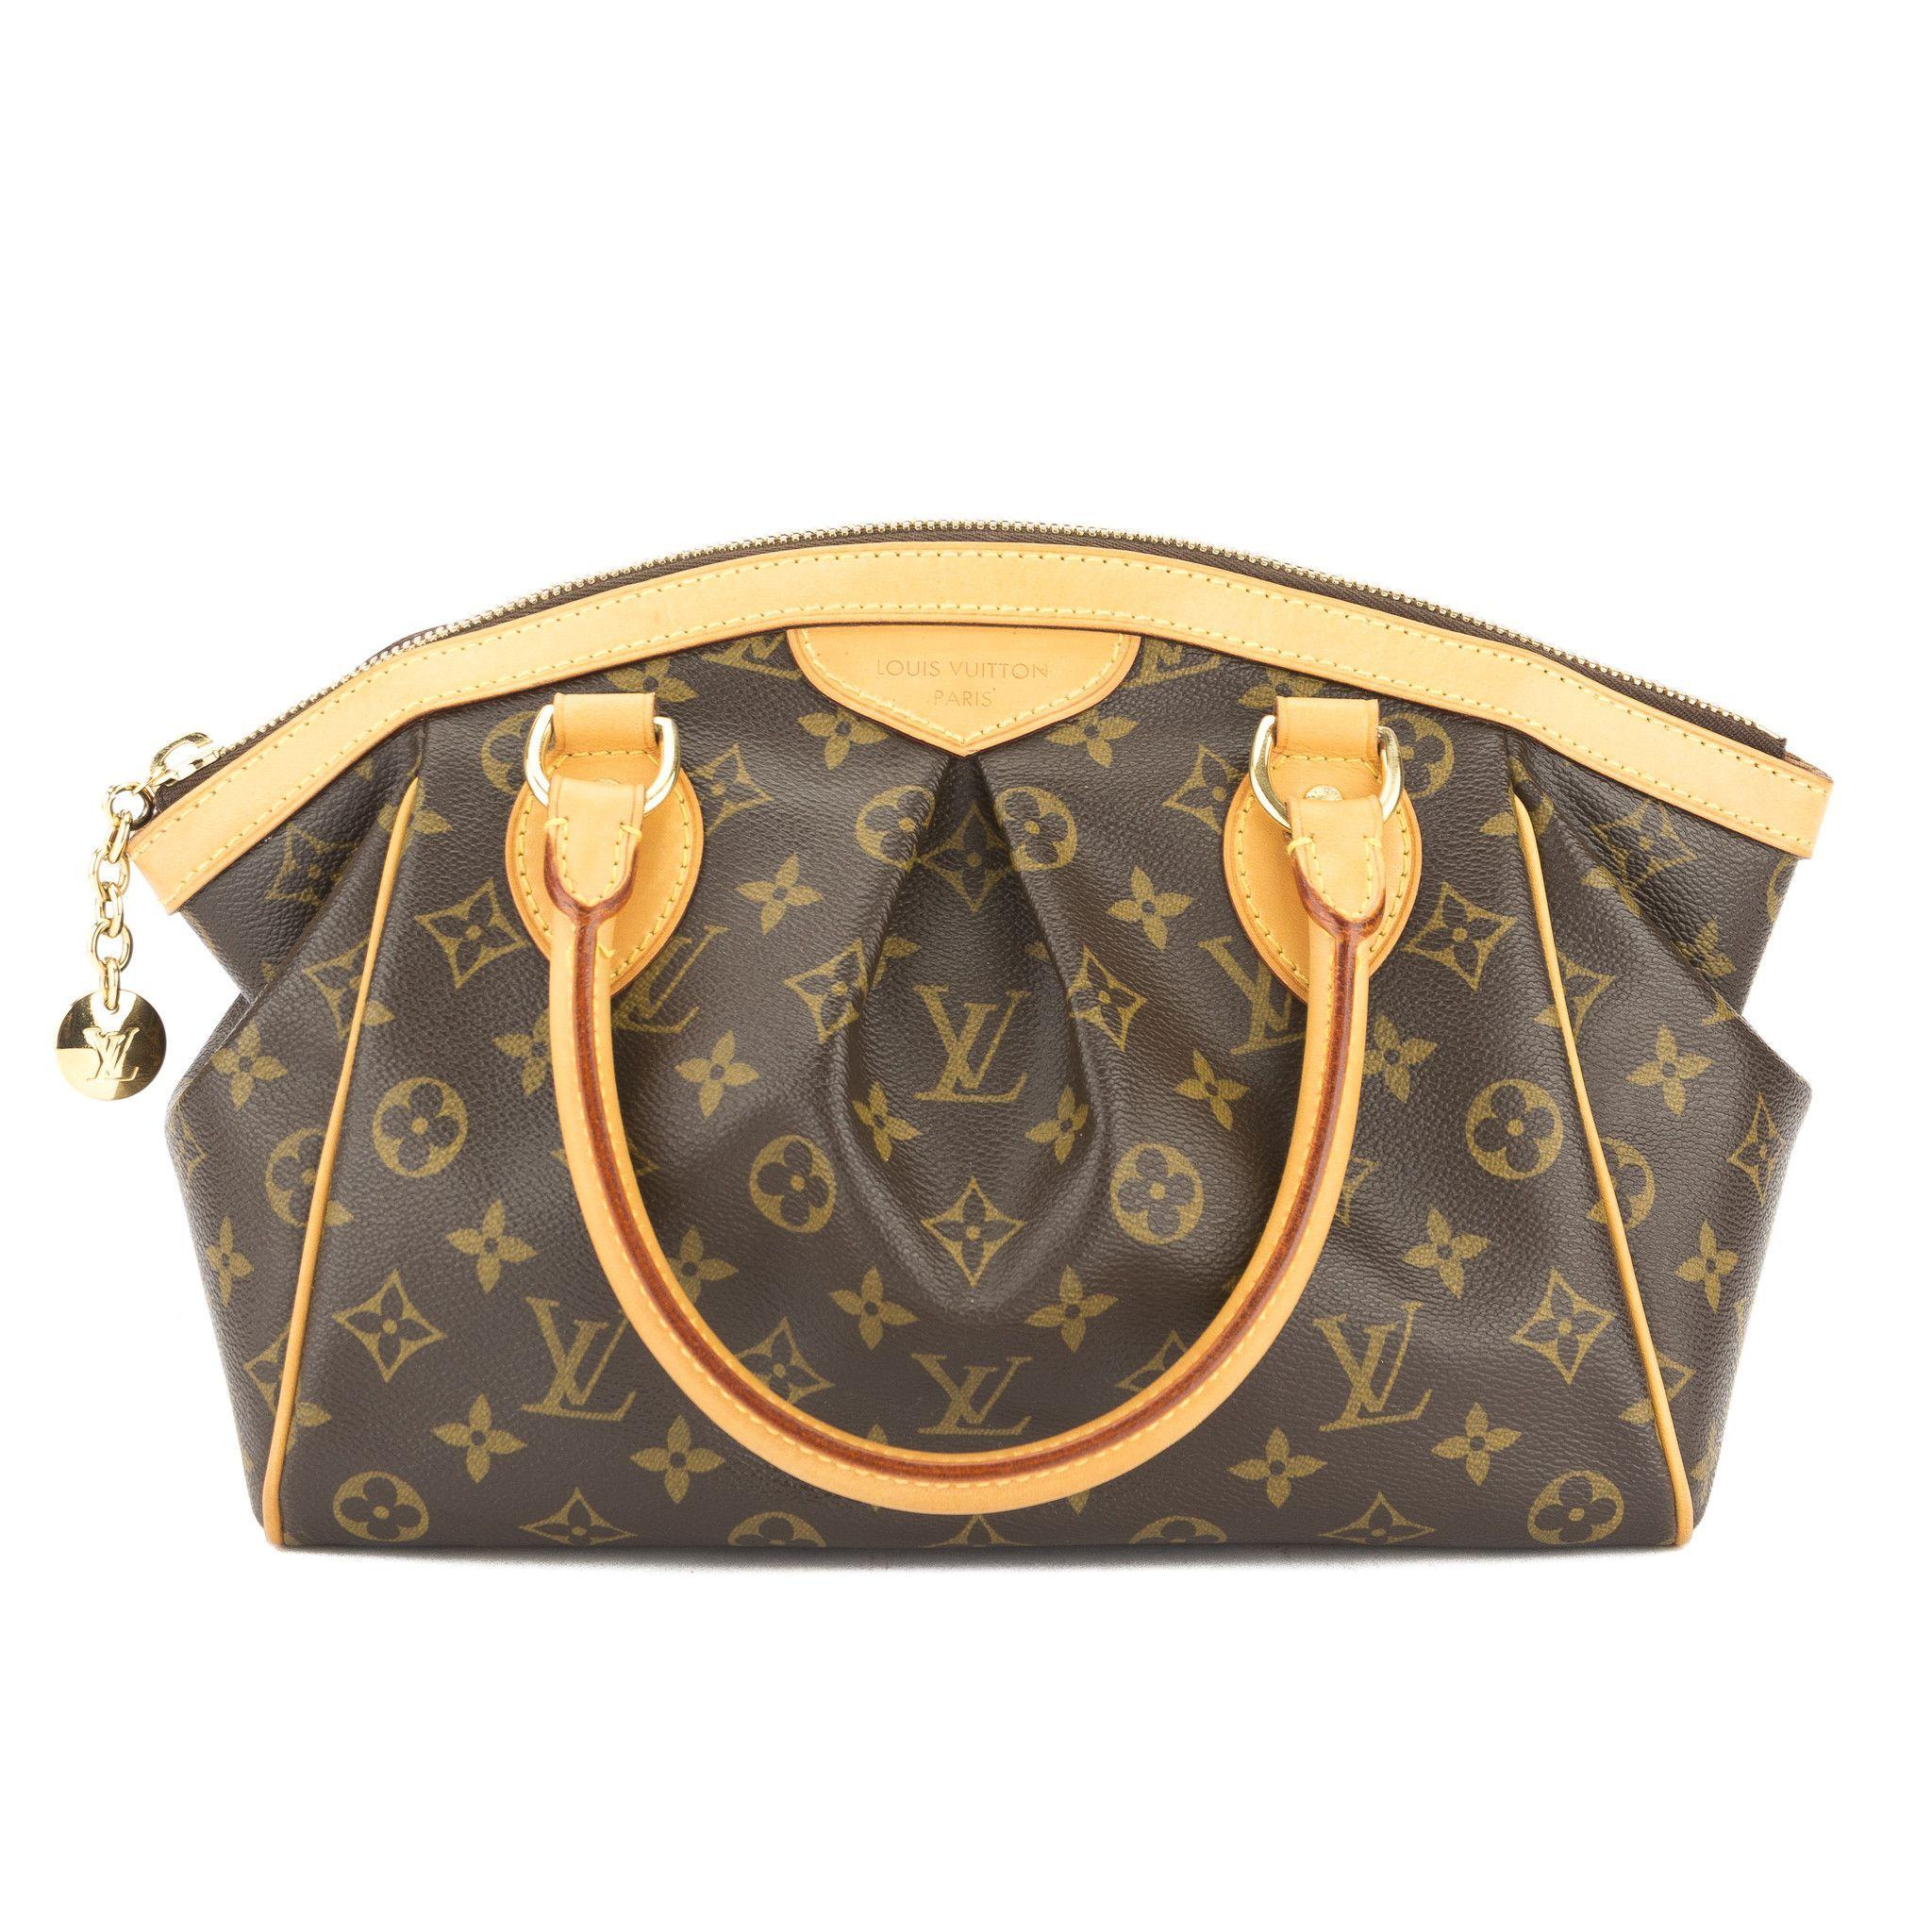 Louis Vuitton Monogram Tivoli Pm Bag Authentic Pre Owned